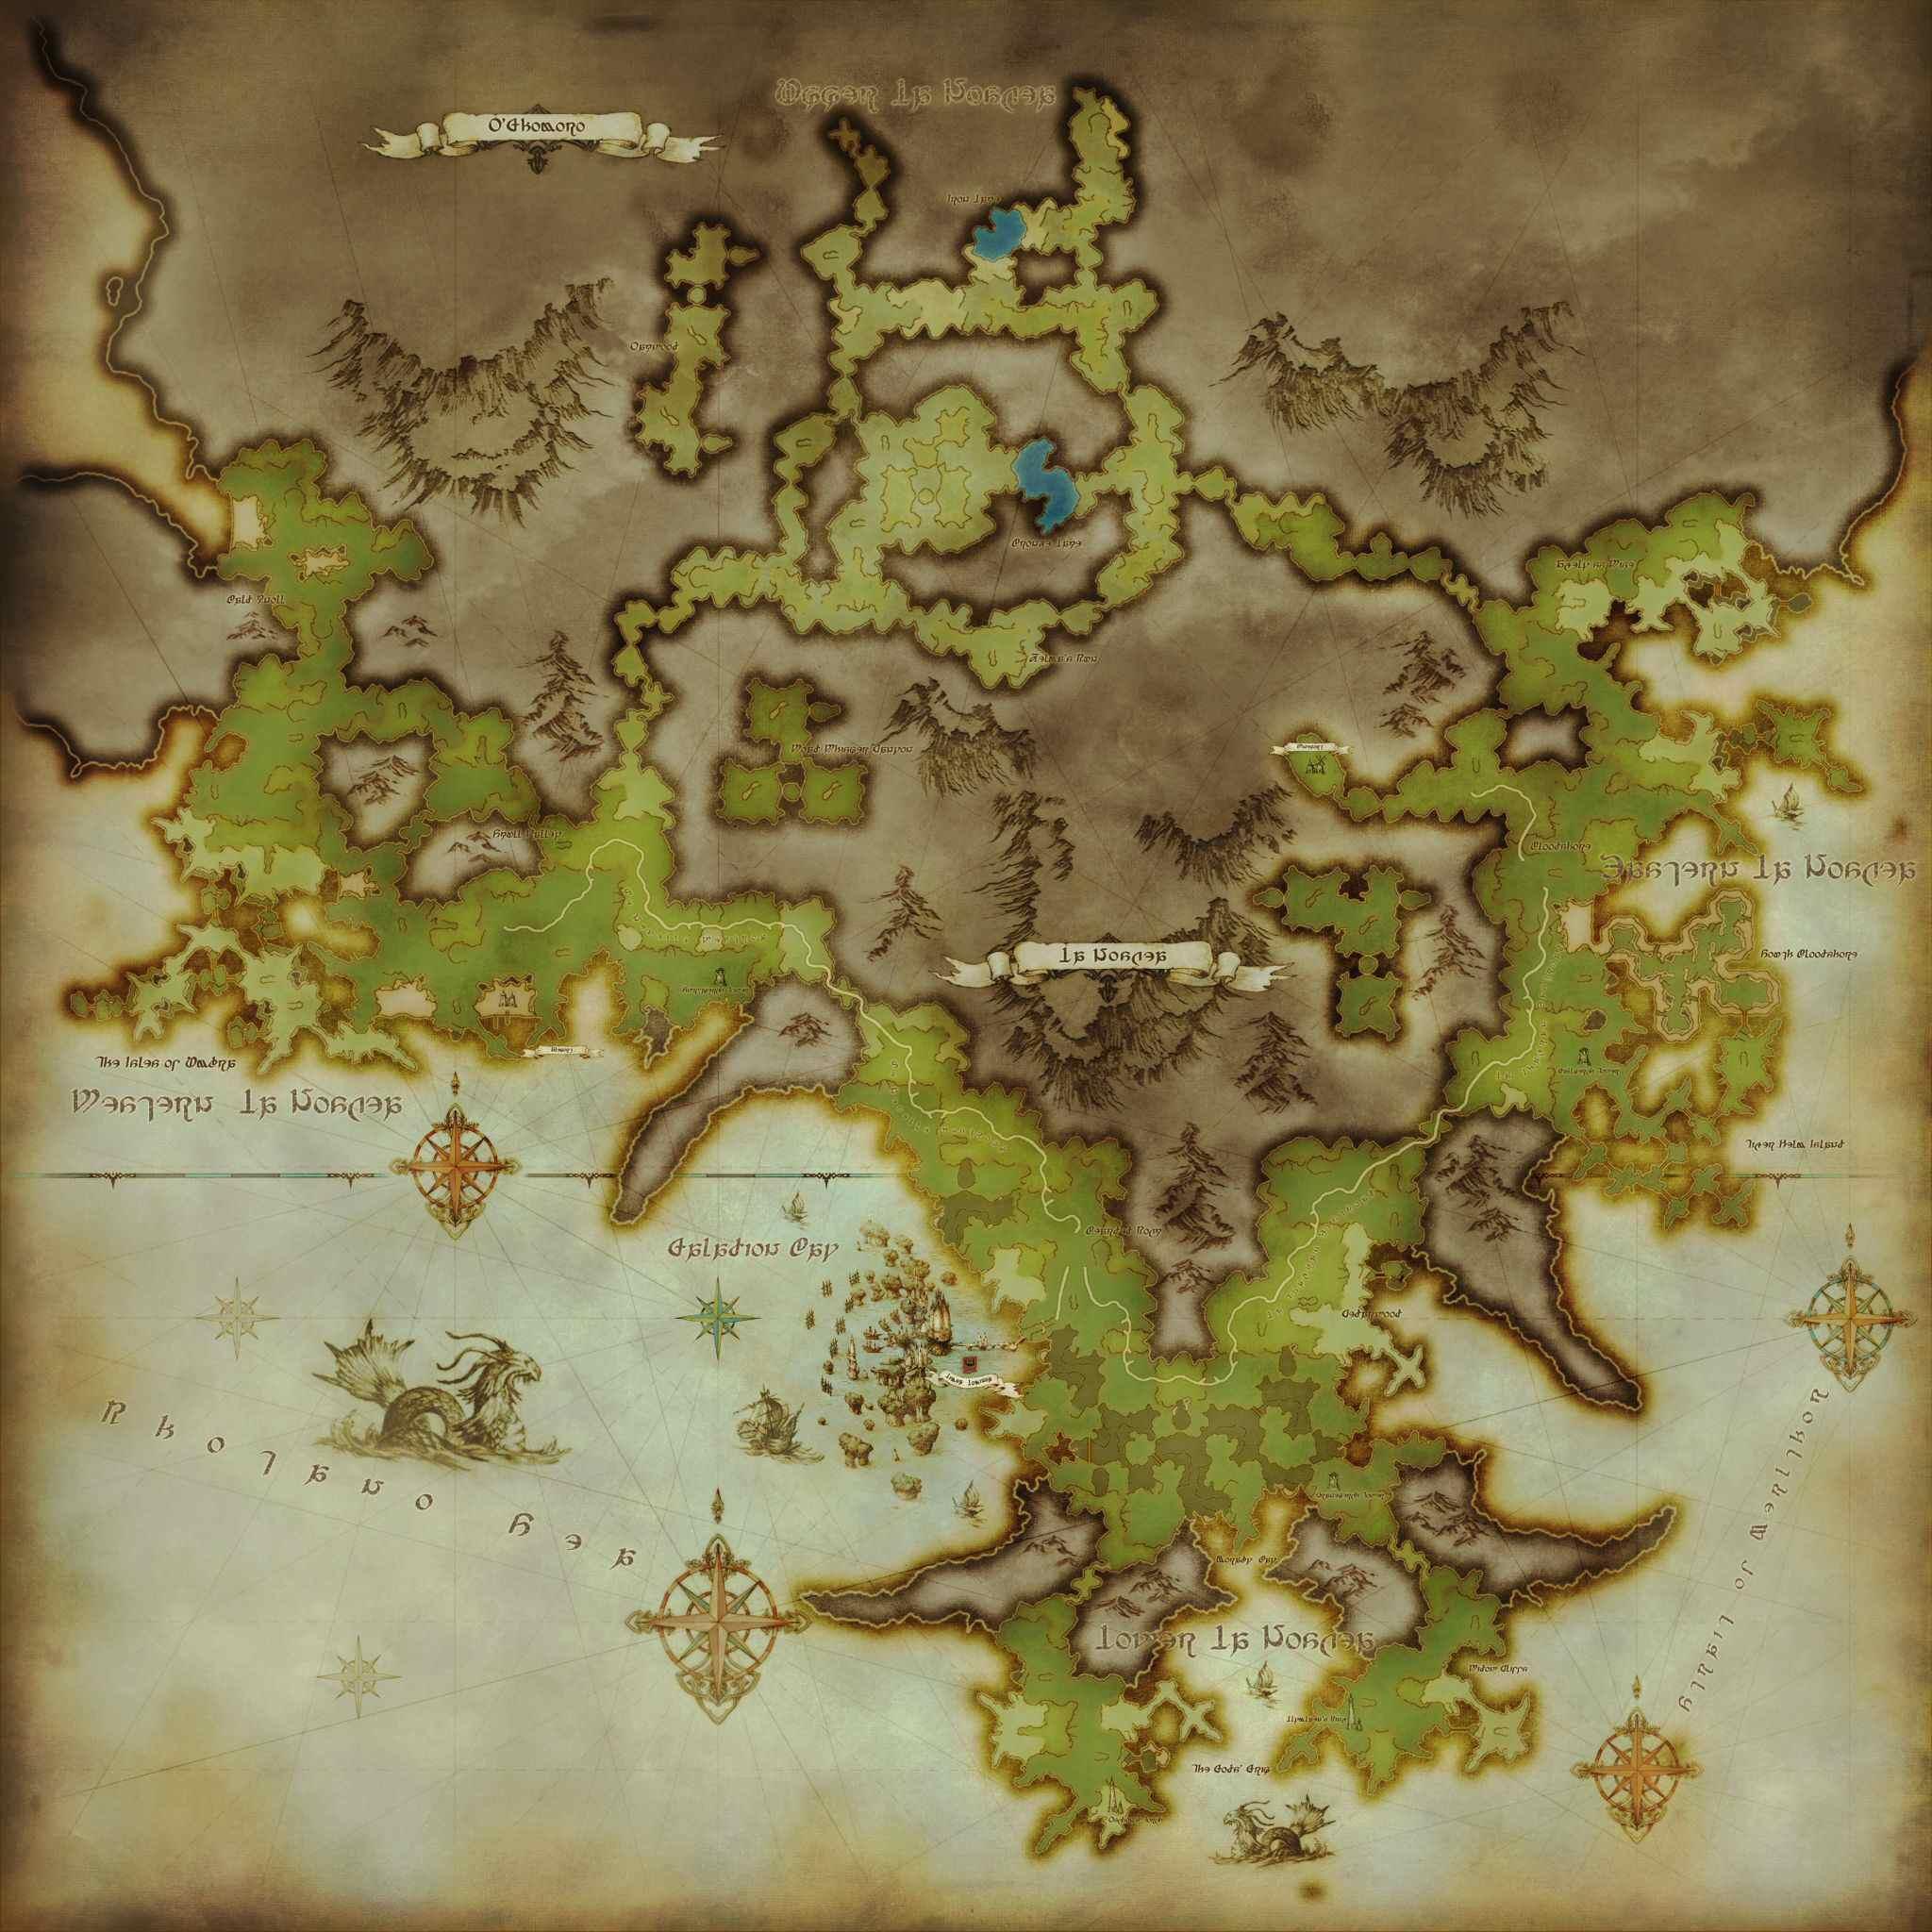 Final Fantasy 13 World Map.La Noscea Maps Ffxiv A Realm Reborn Info Ff14